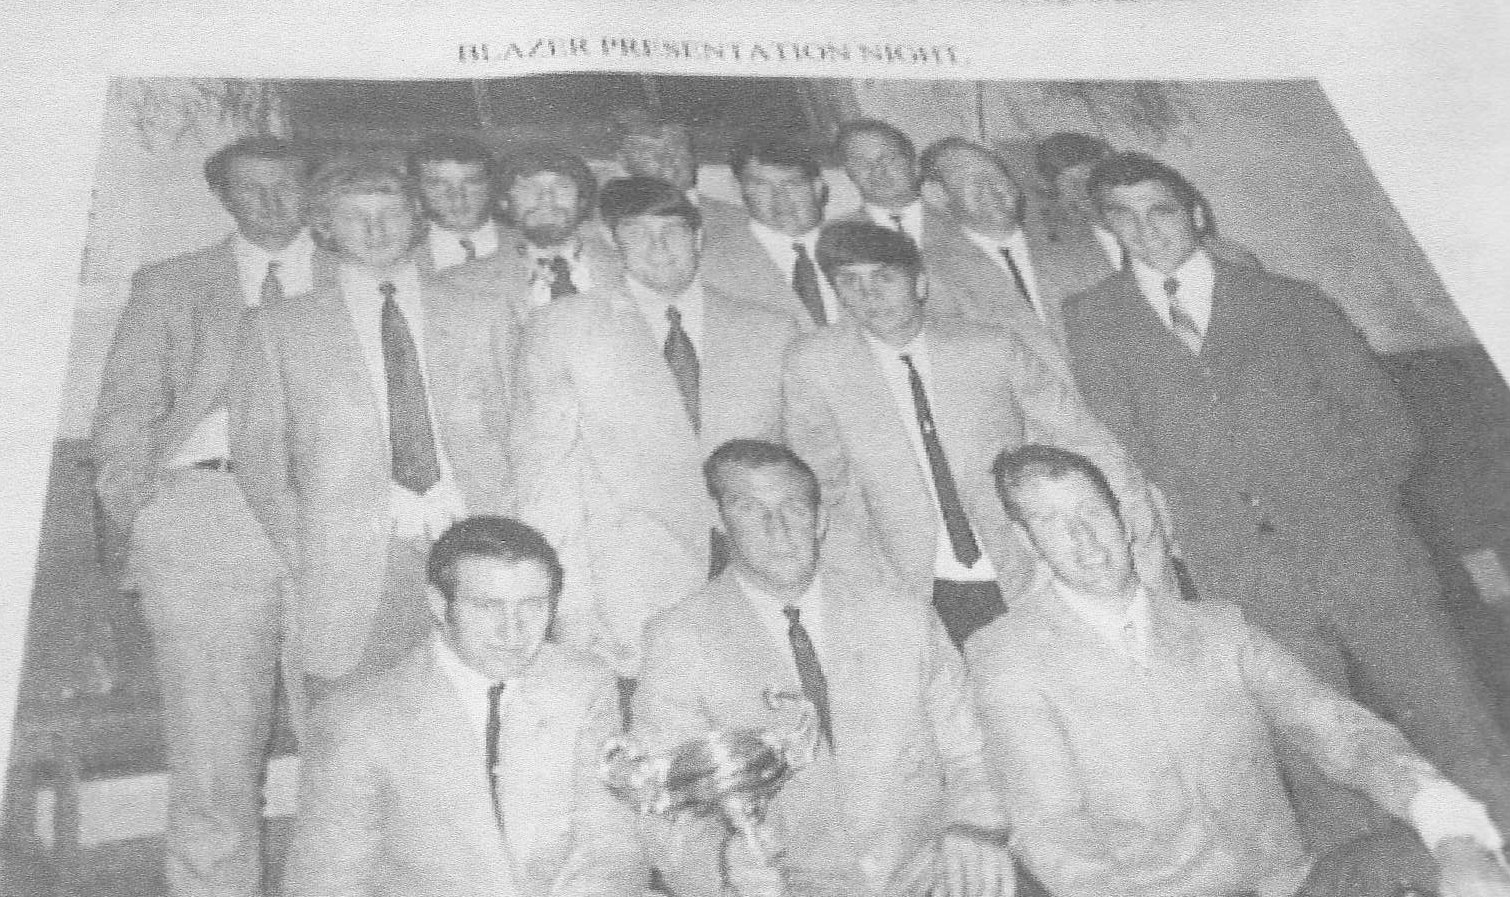 1970 Delegate Clayton Cup Blazer presentation